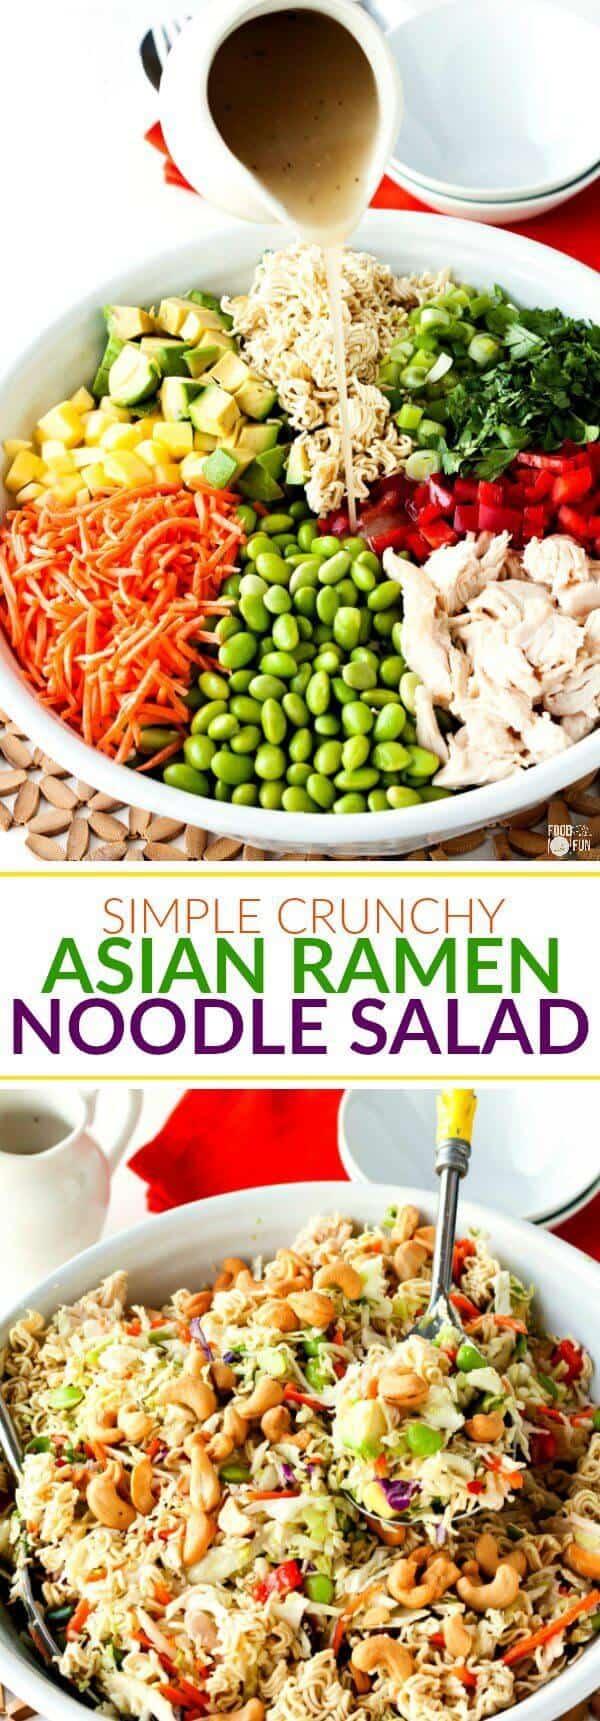 Simple Crunchy Asian Ramen Noodle Salad - The Best Blog Recipe